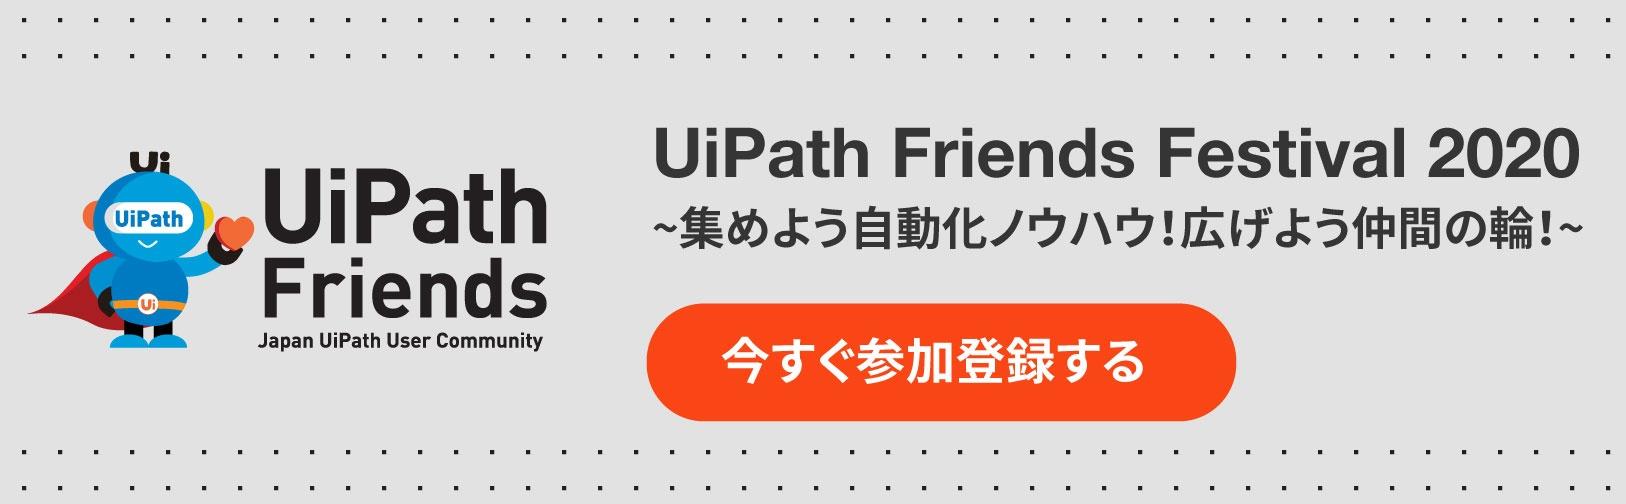 UiPath Friends Festival 2020に今すぐ参加登録する